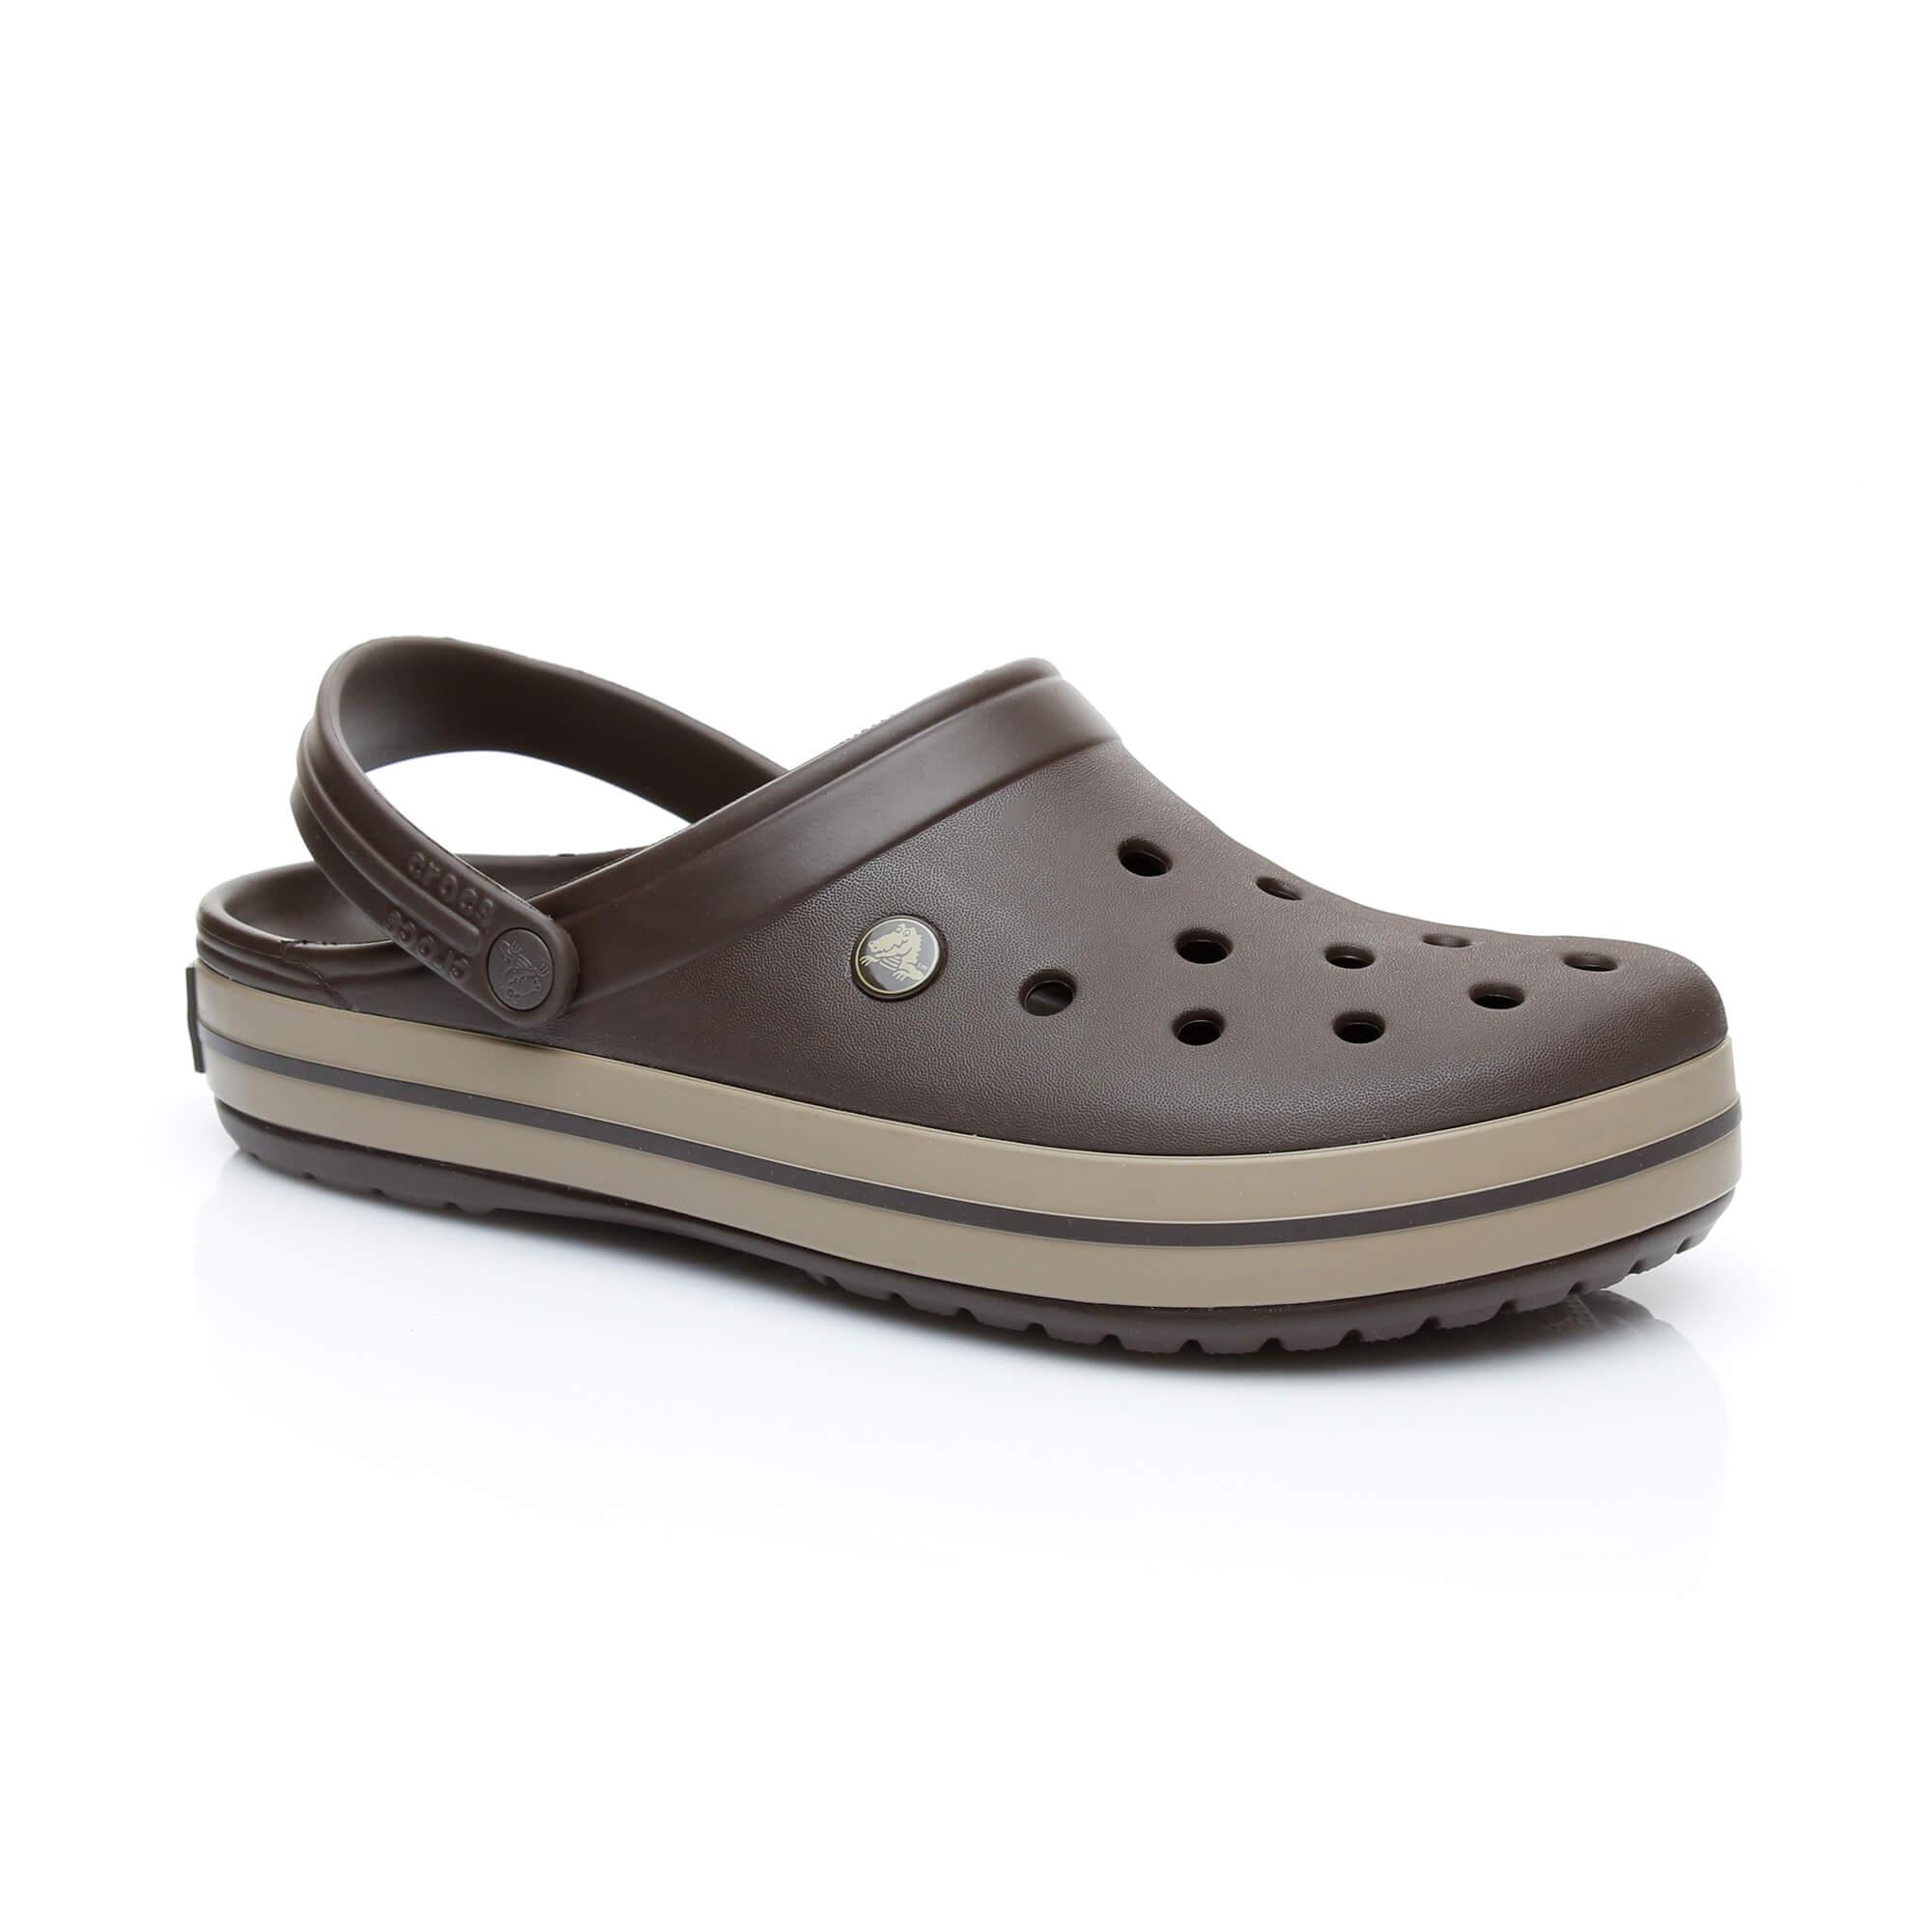 Crocs Crocband Clog Unisex Kahverengi Terlik